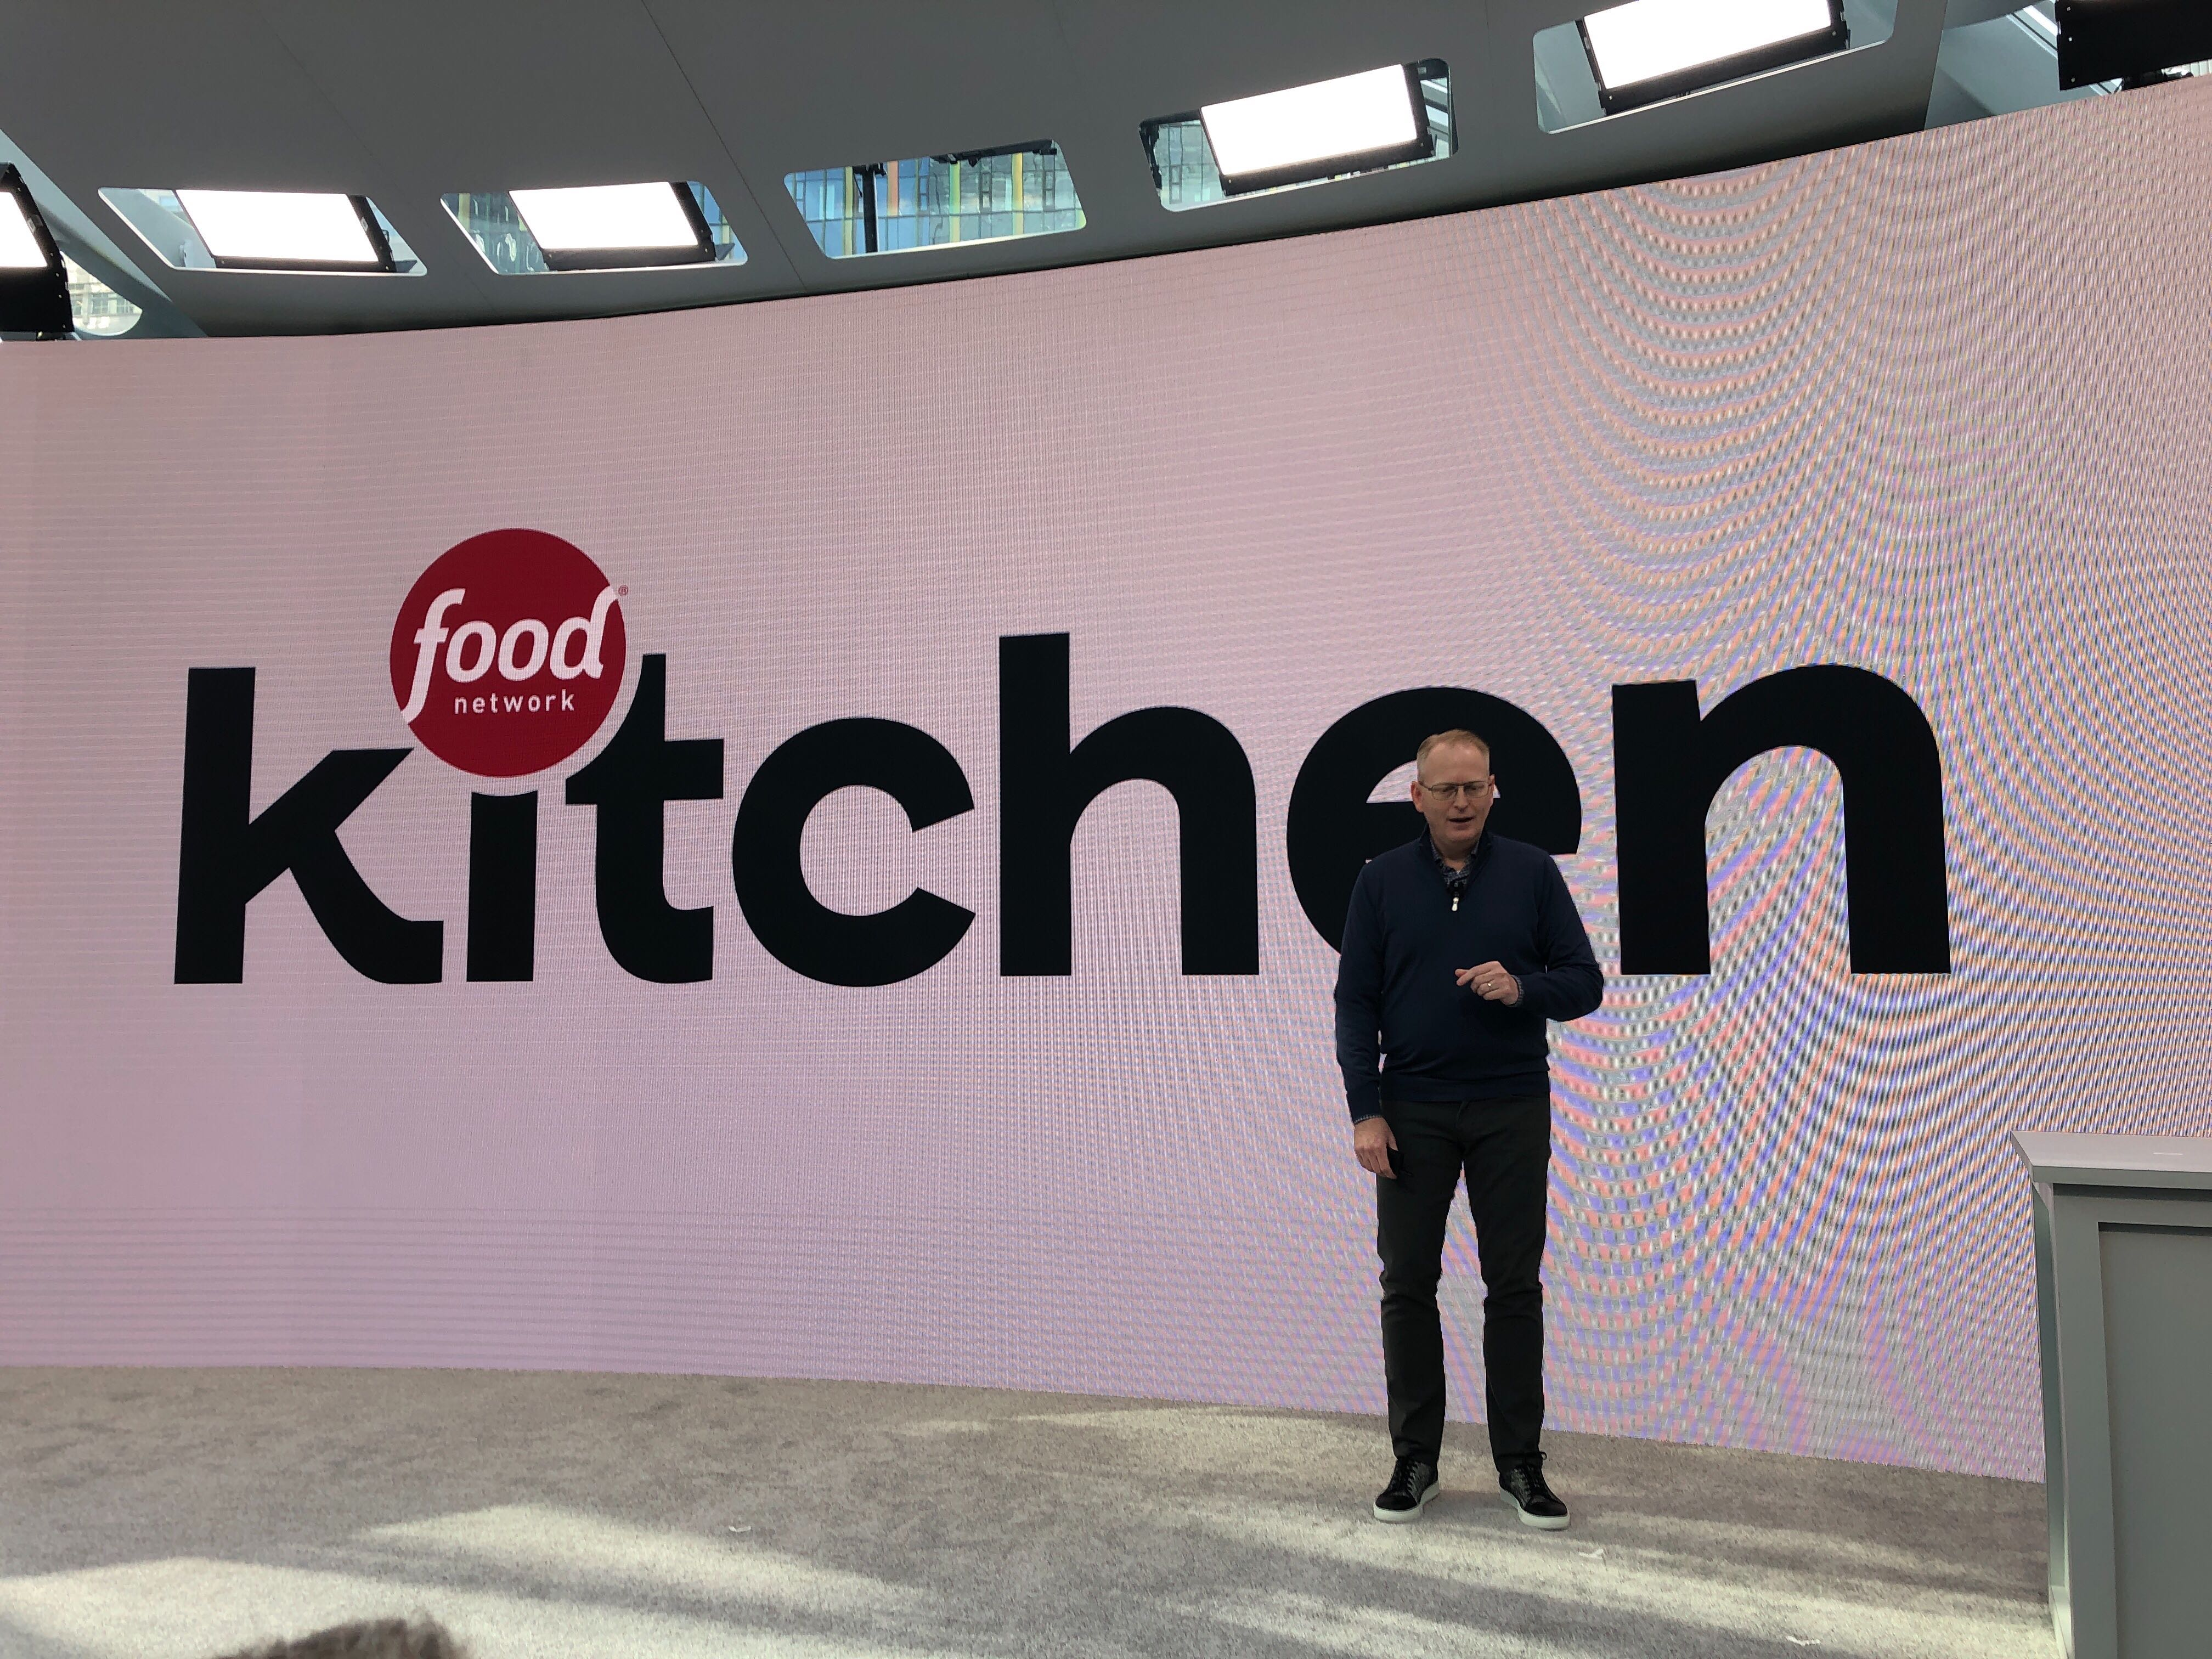 Amazon S New Alexa Food Network Service Aims To Make Echo The